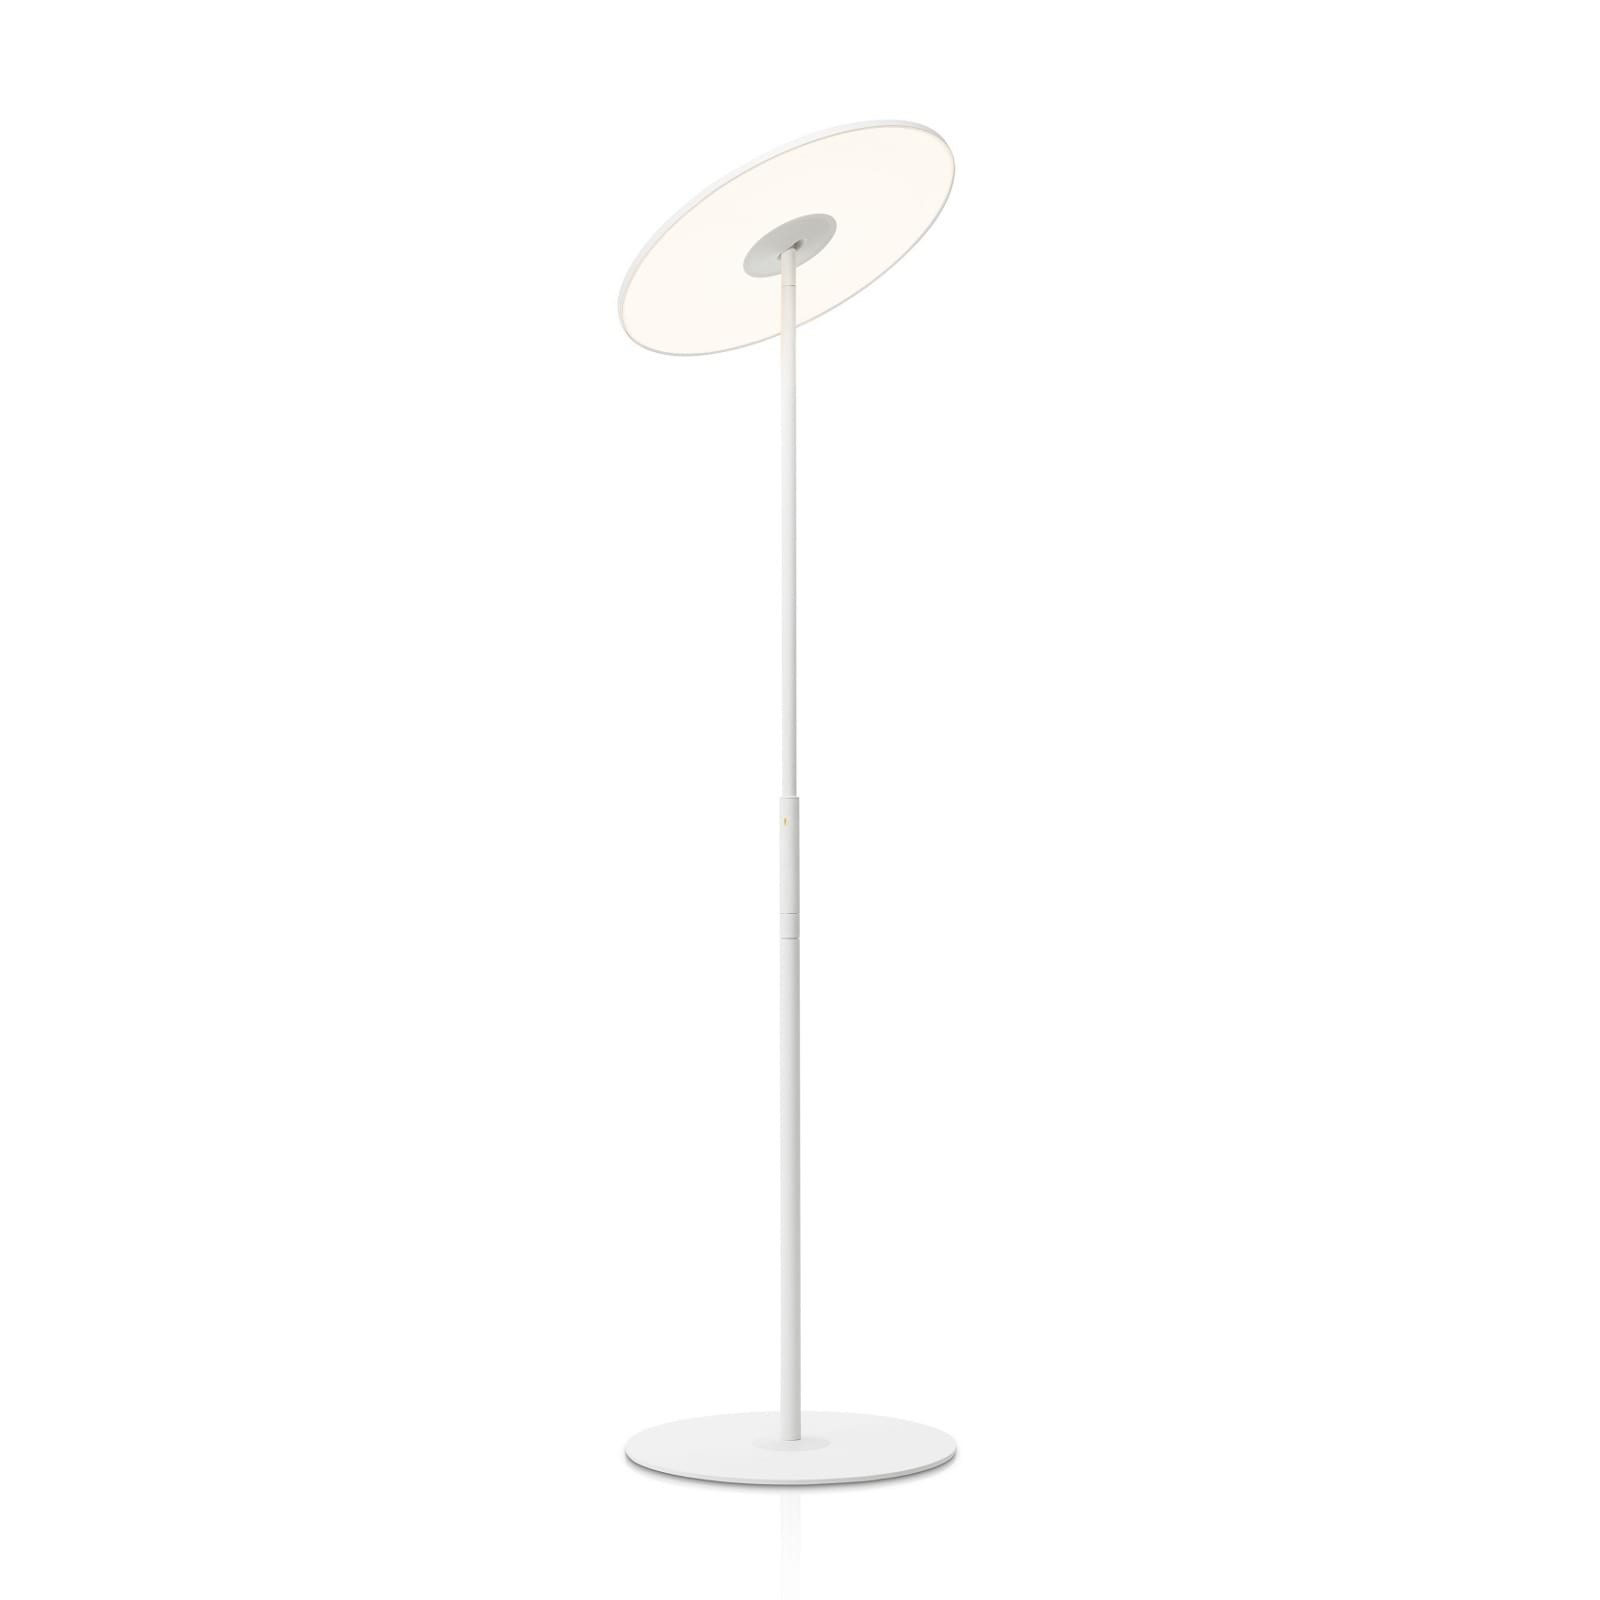 Circa Φωτιστικό Δαπέδου LED (Λευκό) - Pablo Designs